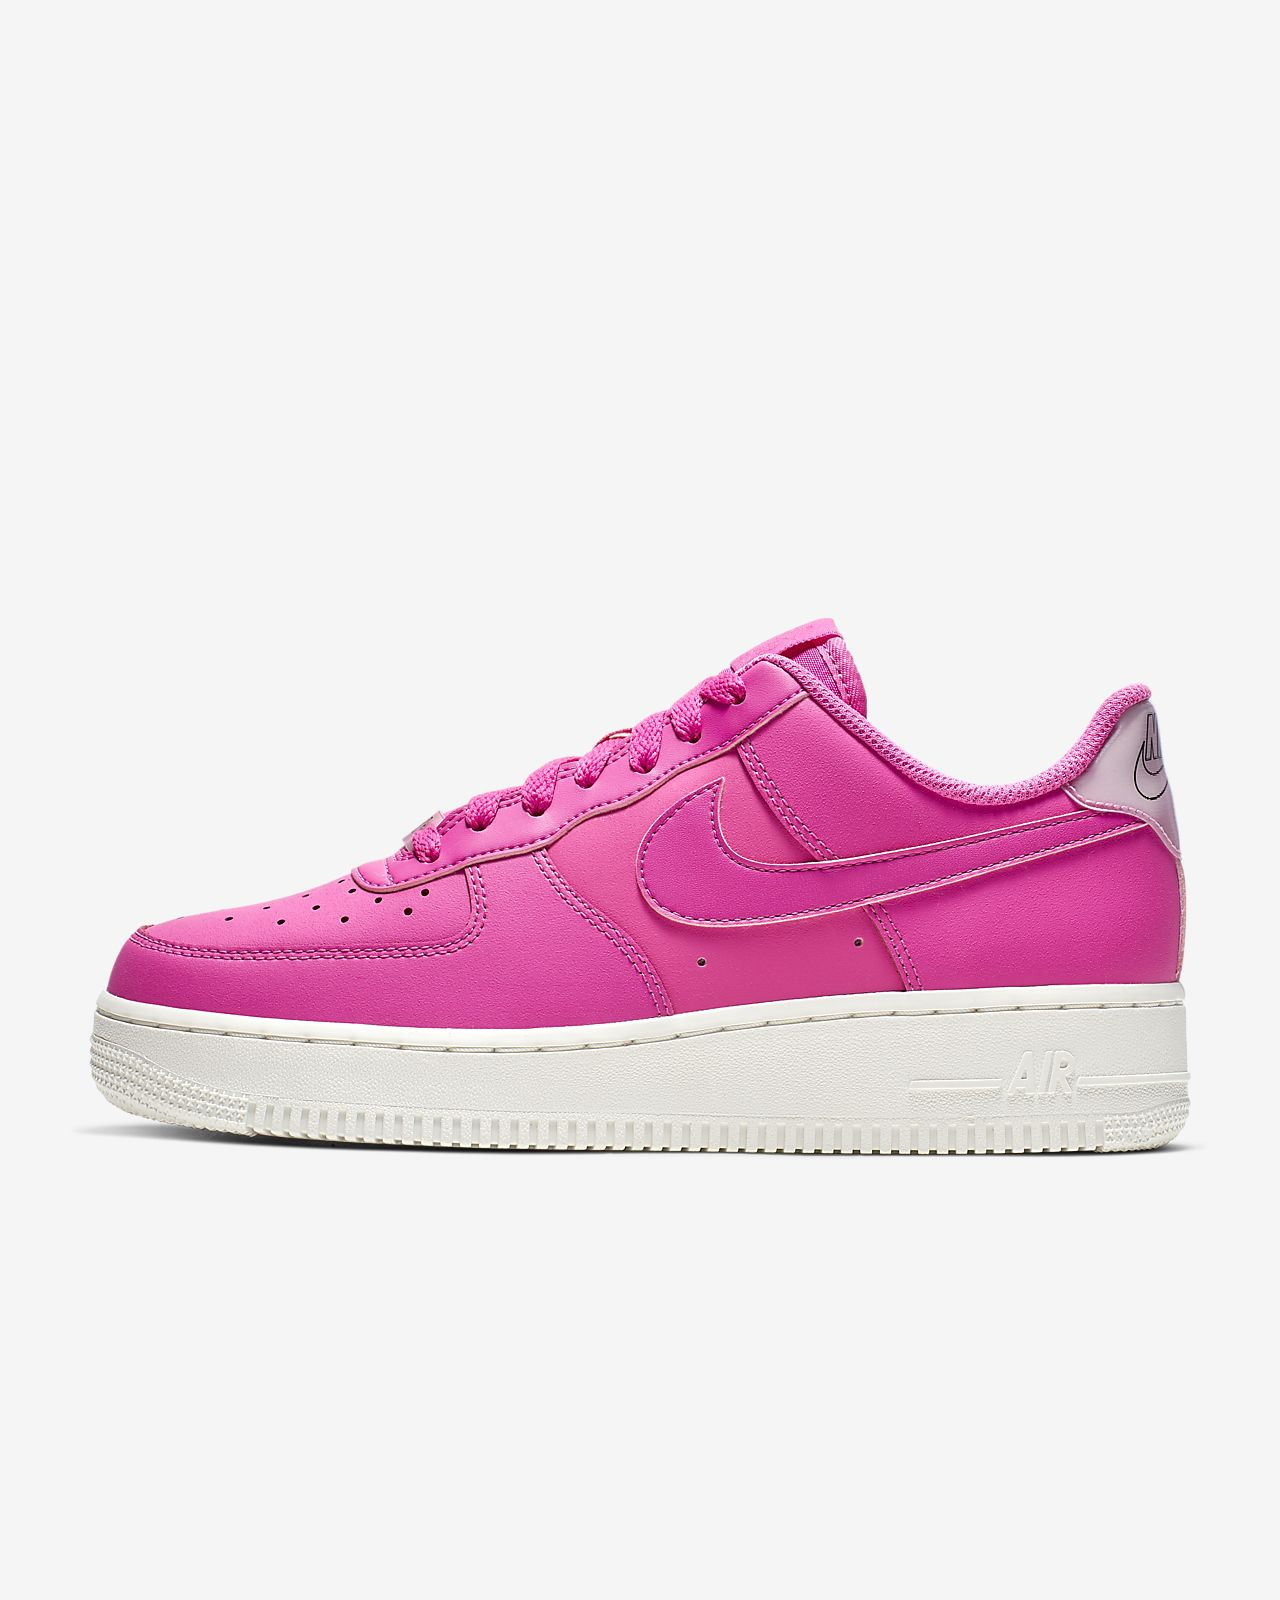 Nike Air Force 1 '07 Essential Damenschuh